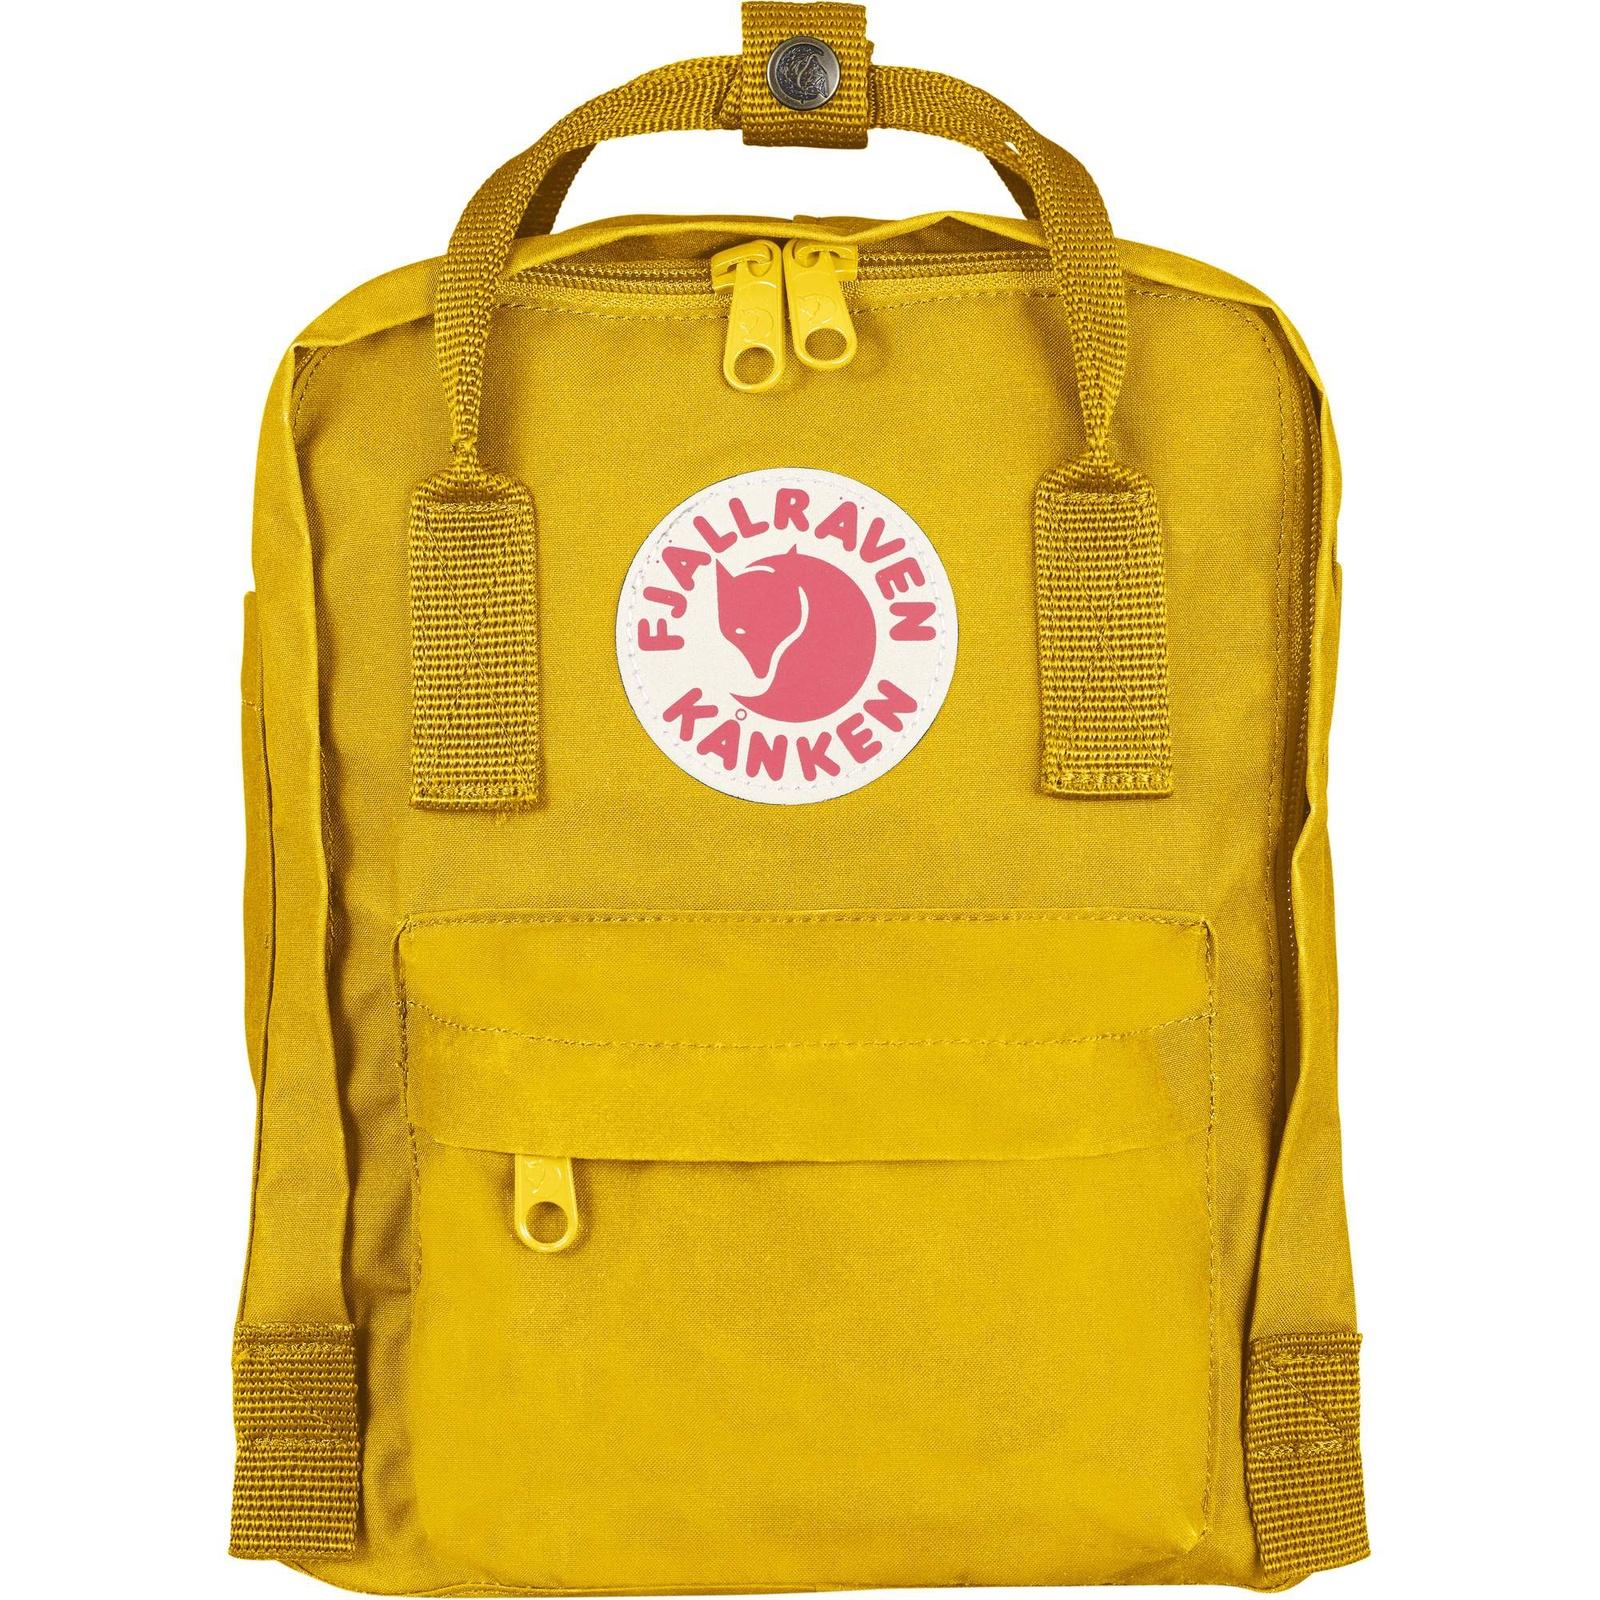 Рюкзак Fjallraven Kanken Mini 141, 23561/141, желтый цена и фото